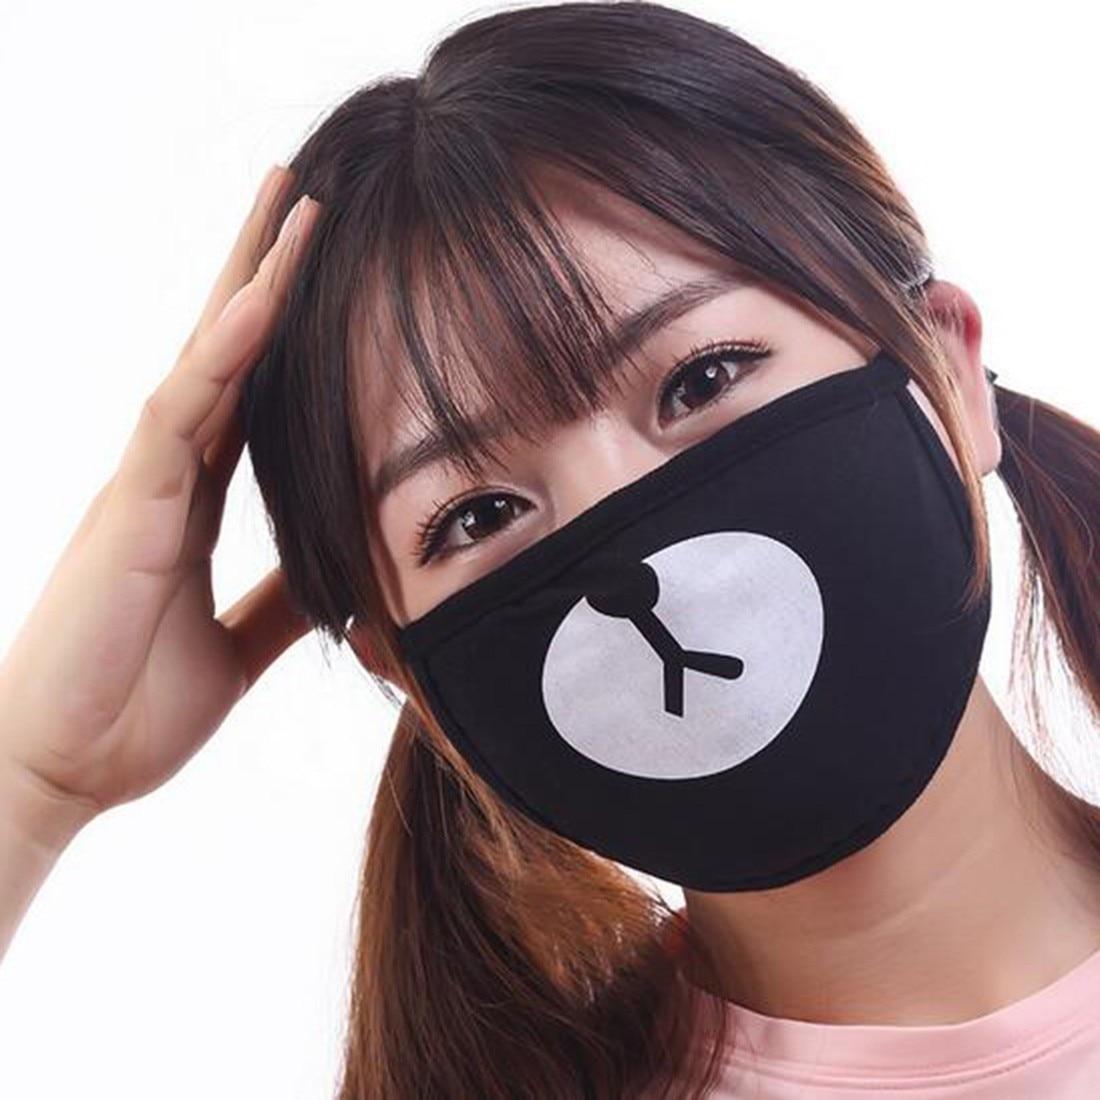 Hot 1pc Unisex Dustproof Cotton Mouth Mask Korean Kpop Style Black Lucky Bear Cycling Anti-Dust Mouth Mask Face Respirator çerçevesiz güneş gözlük modelleri bayan